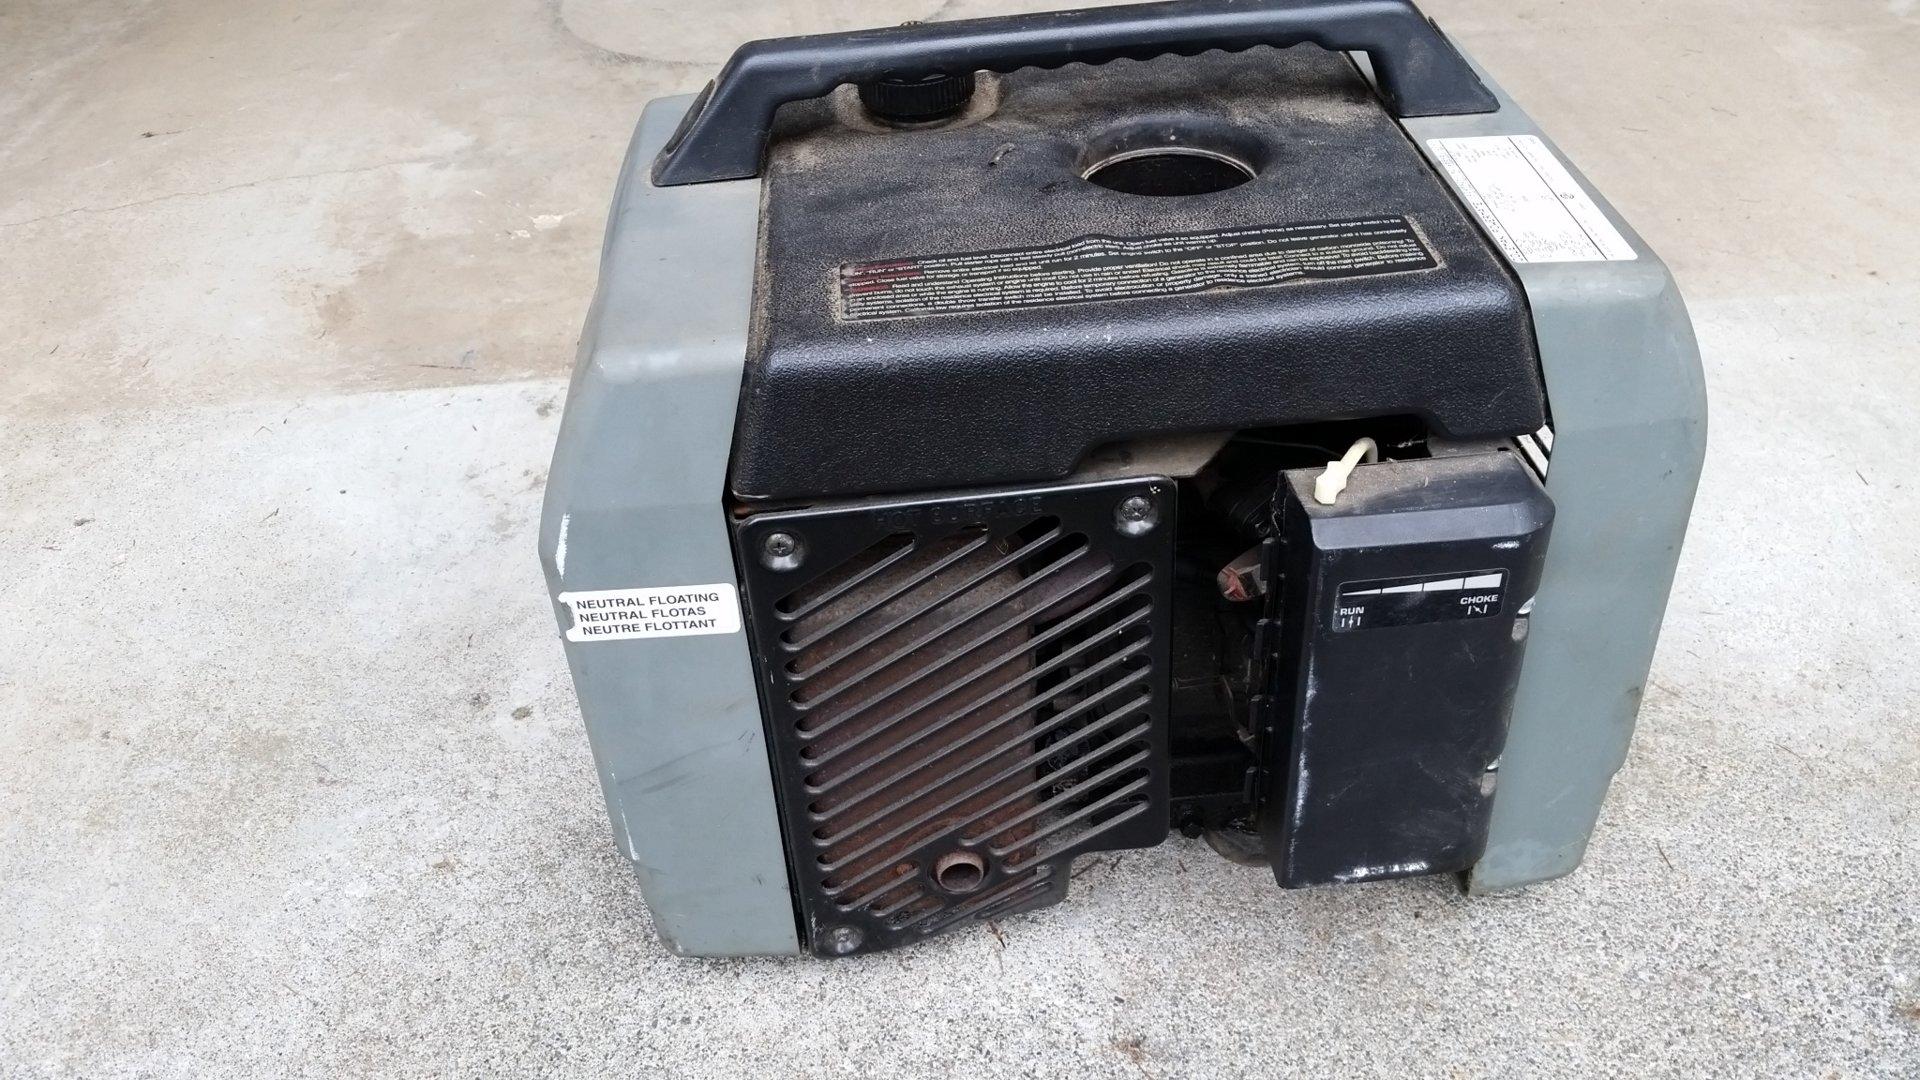 What Size Generator For Rv >> Coleman Power Mate 1850 Generator | Bloodydecks